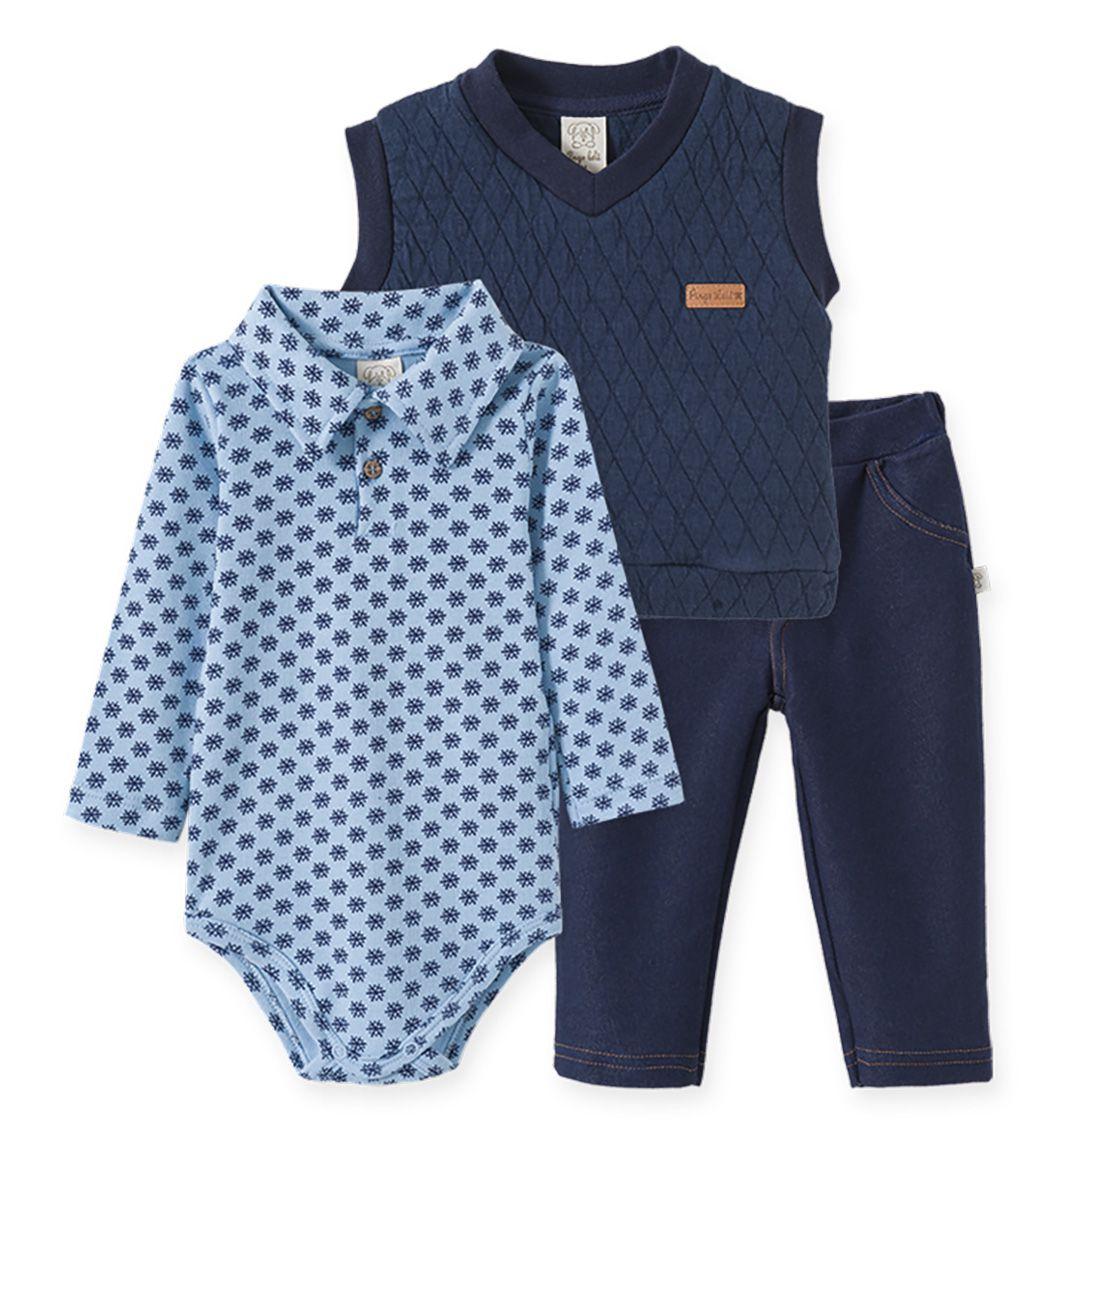 Conjunto Bebê Body Gola Polo Suedine, Calça  Cotton Jeans e Colete Metalassê Pelo Pingo Lelê  Flocos de Neve Azul